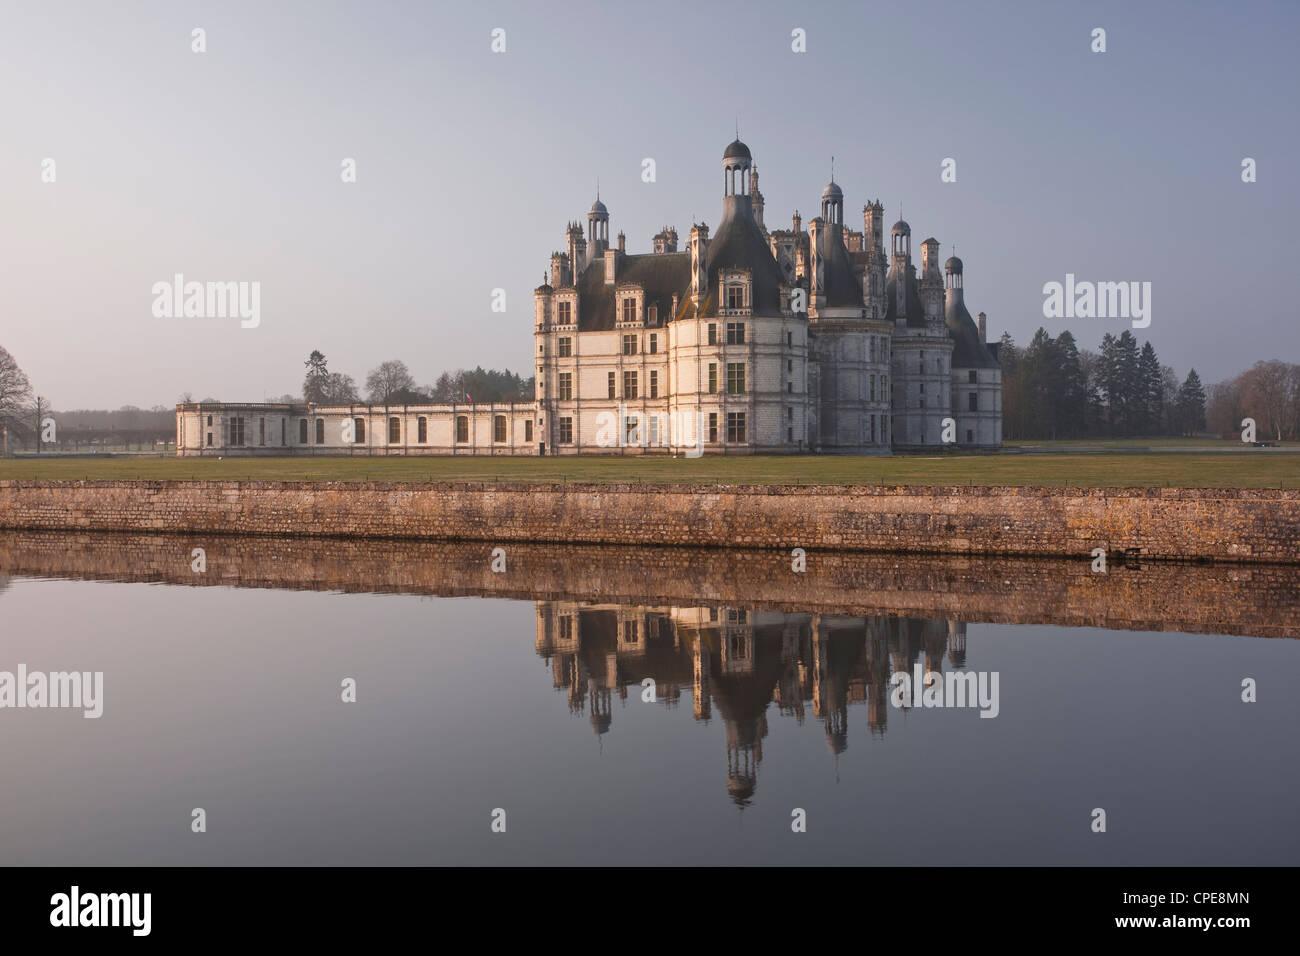 Chateau de Chambord, UNESCO World Heritage Site, Chambord, Loire Valley, France, Europe - Stock Image